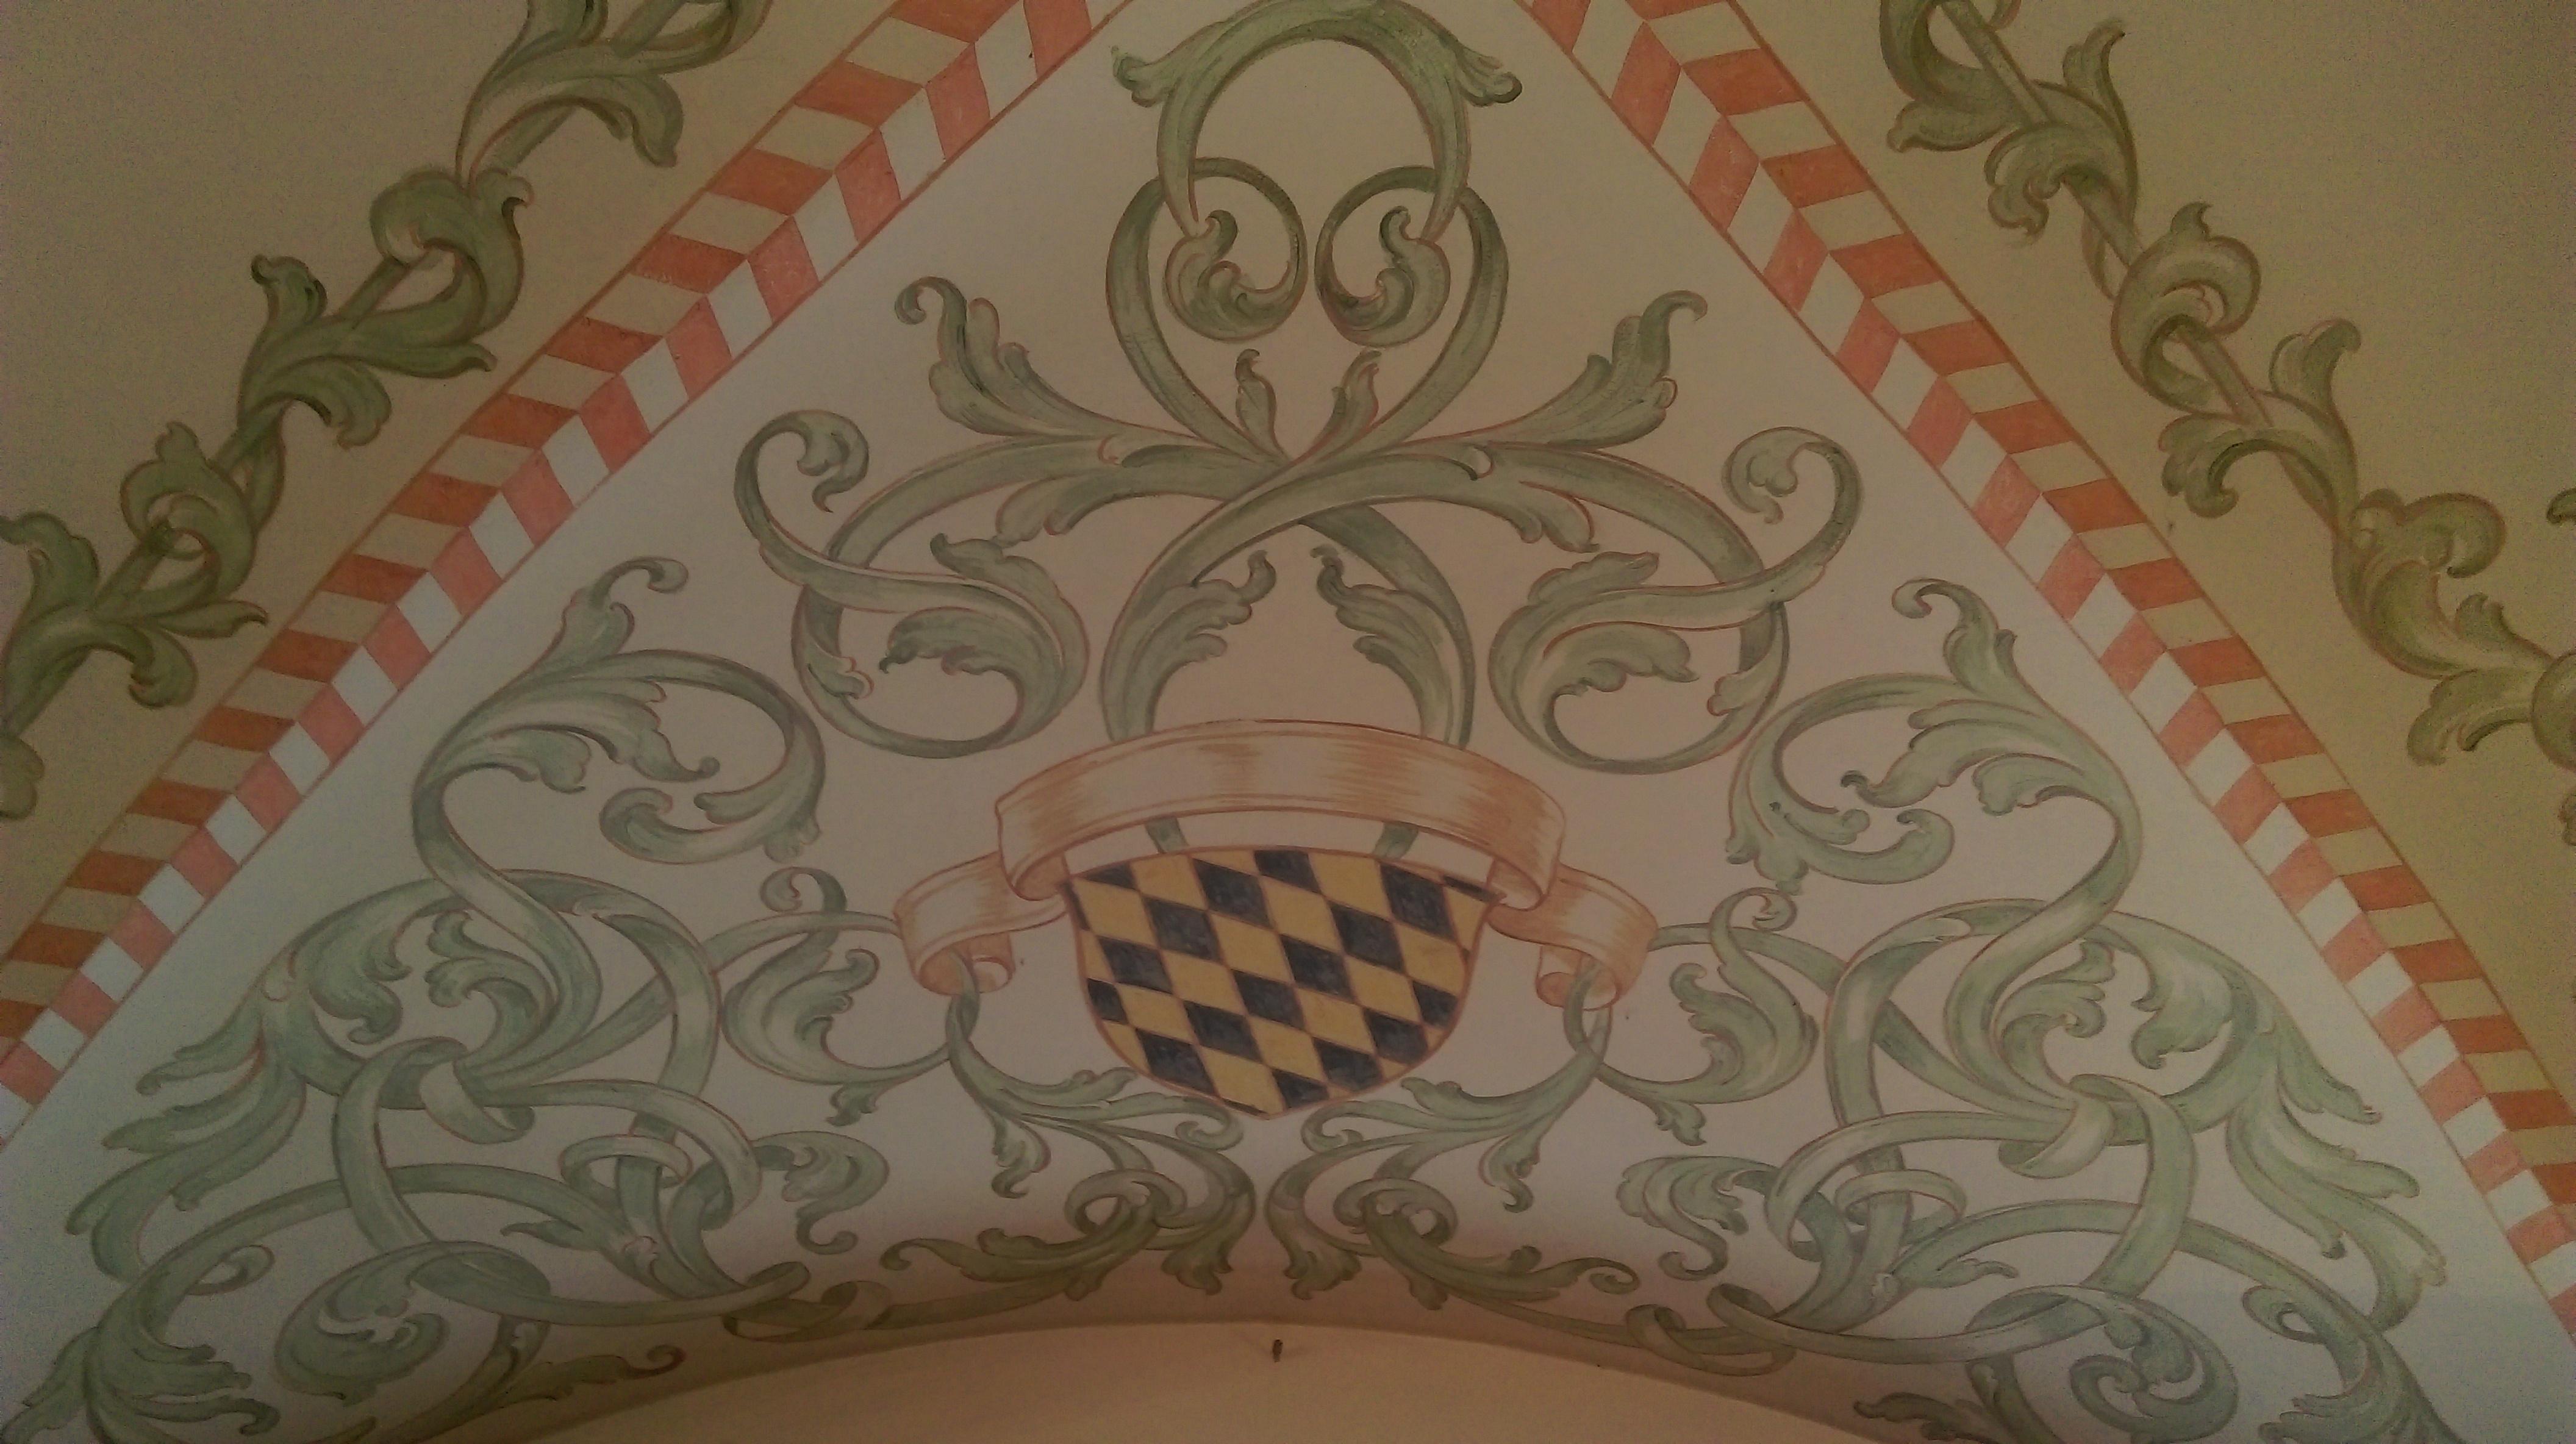 Münchener Wappen